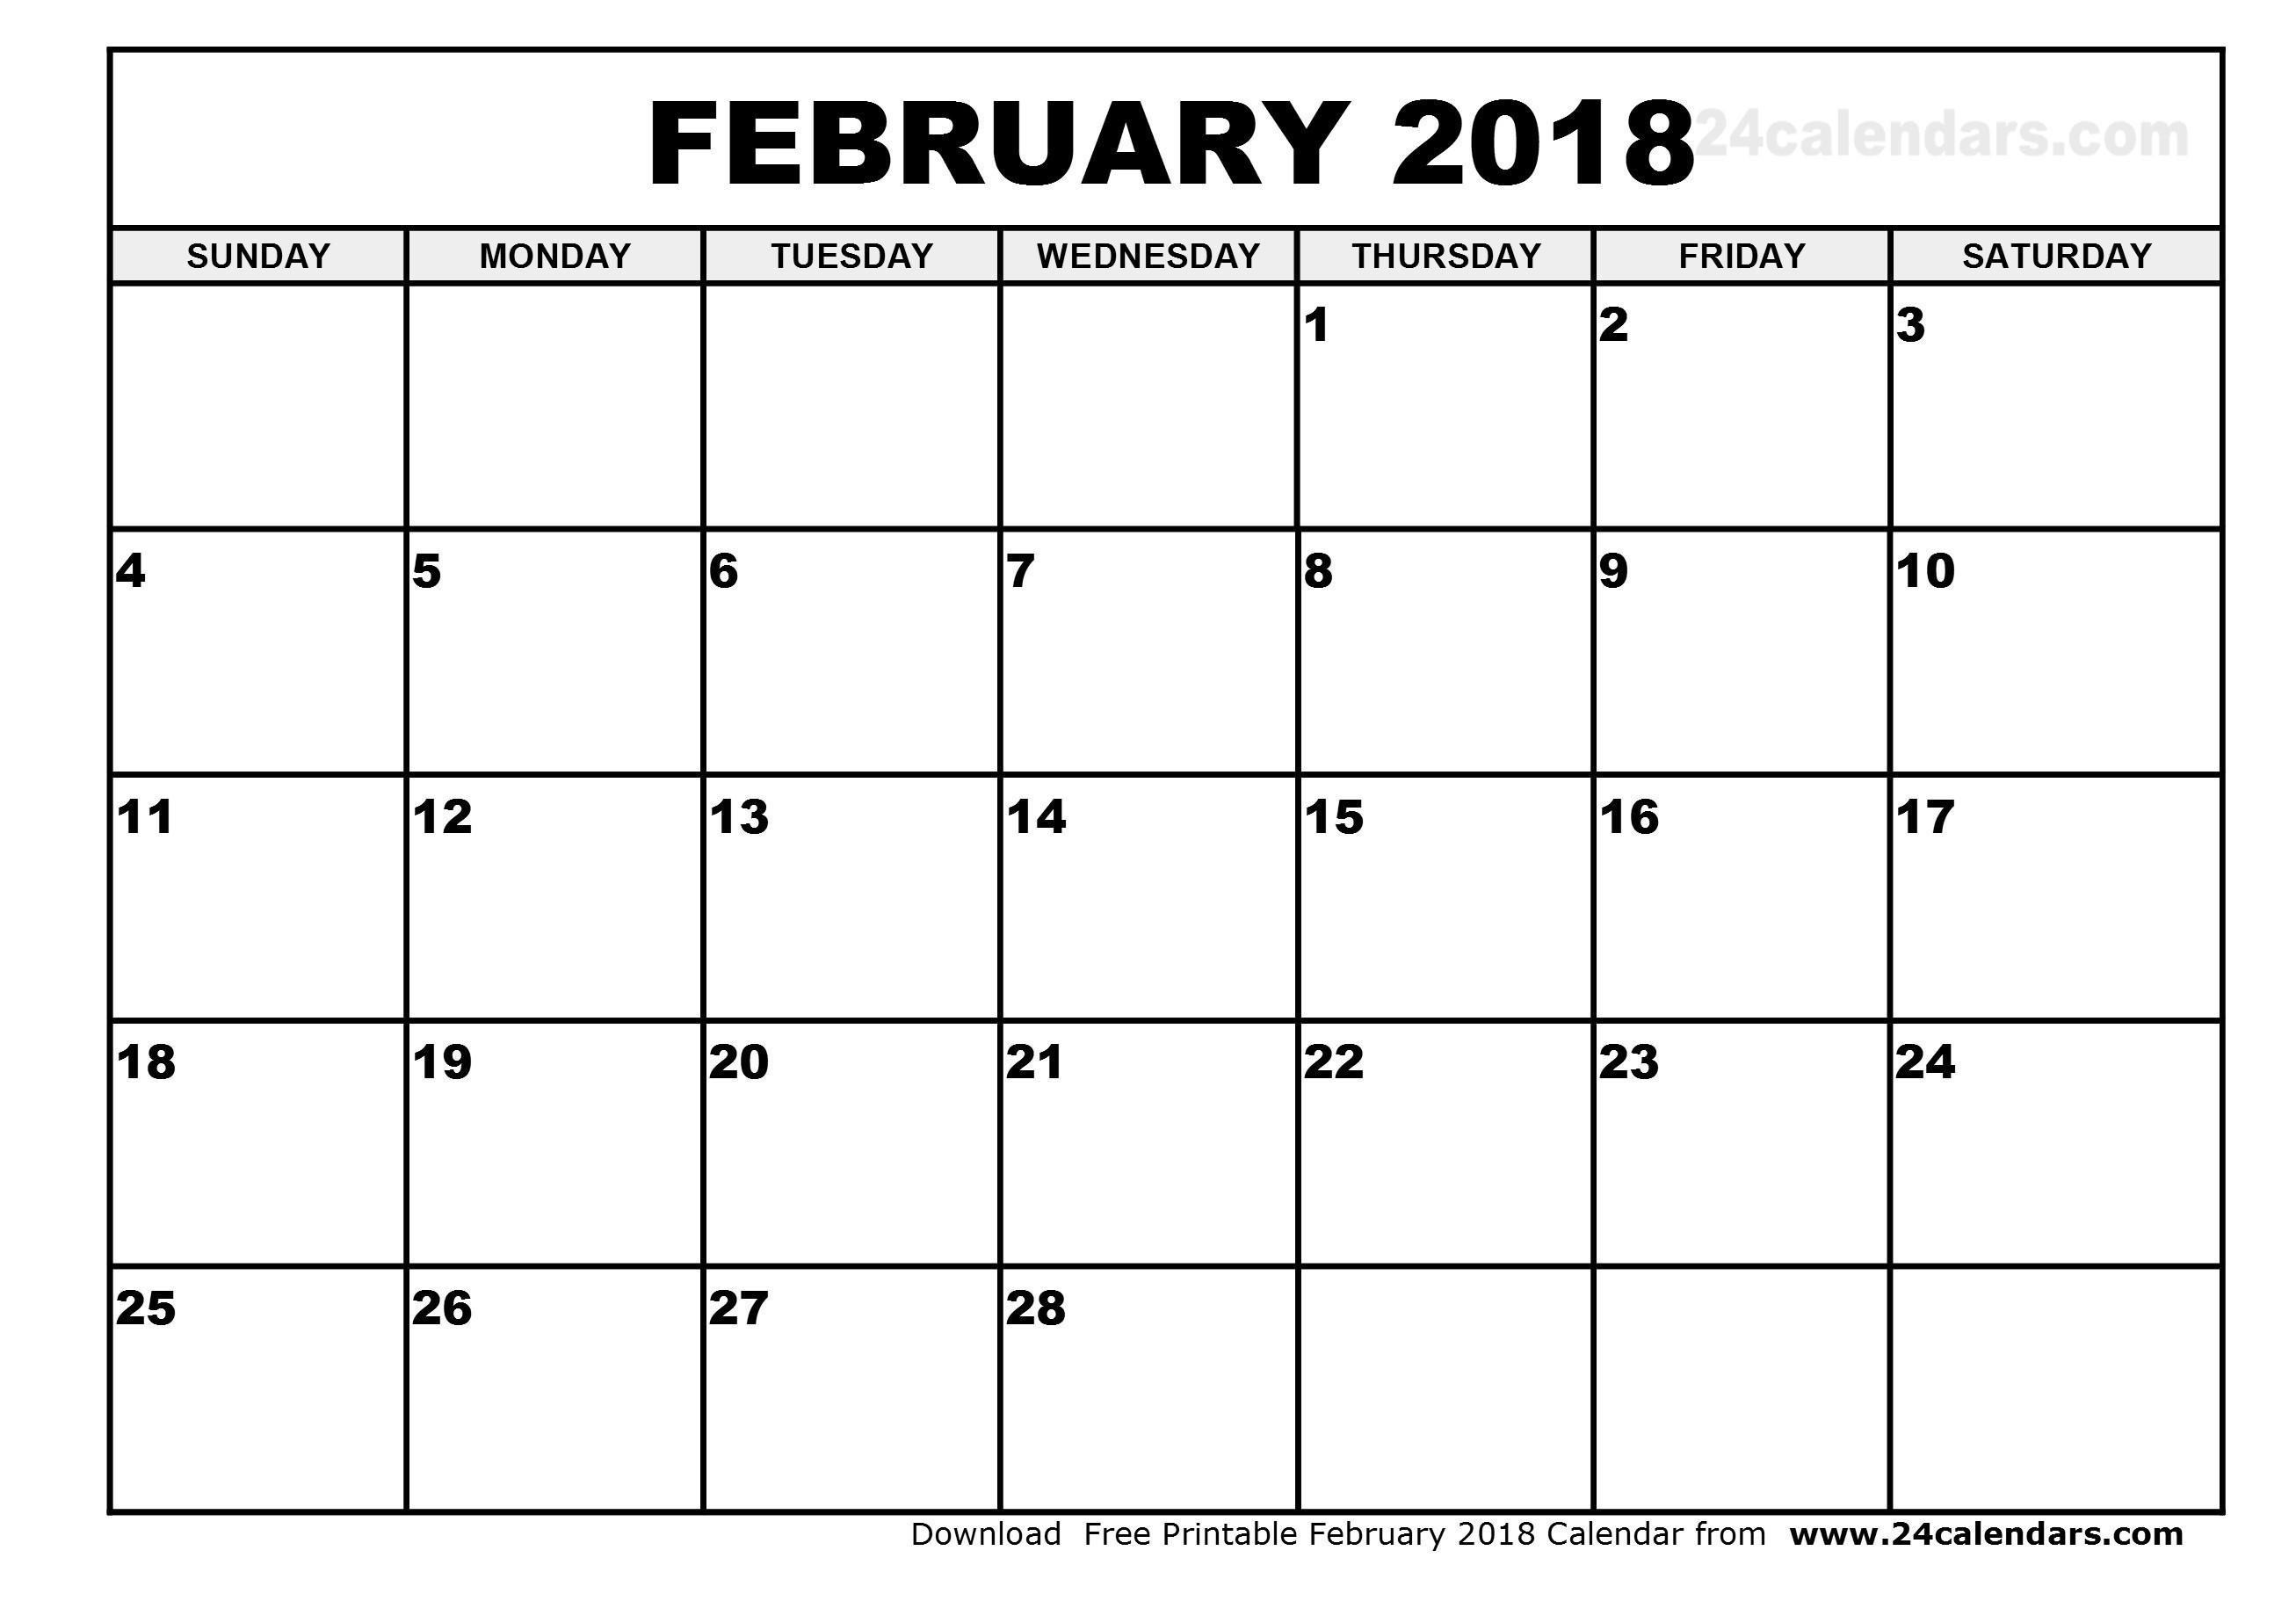 March Calendar Images 2019 Más Actual Calendar 2019 Printable March Calendar February 2019 Printable Of March Calendar Images 2019 Más Recientemente Liberado Printable Calendar Templates Empty Calendar Template Awesome Elegant